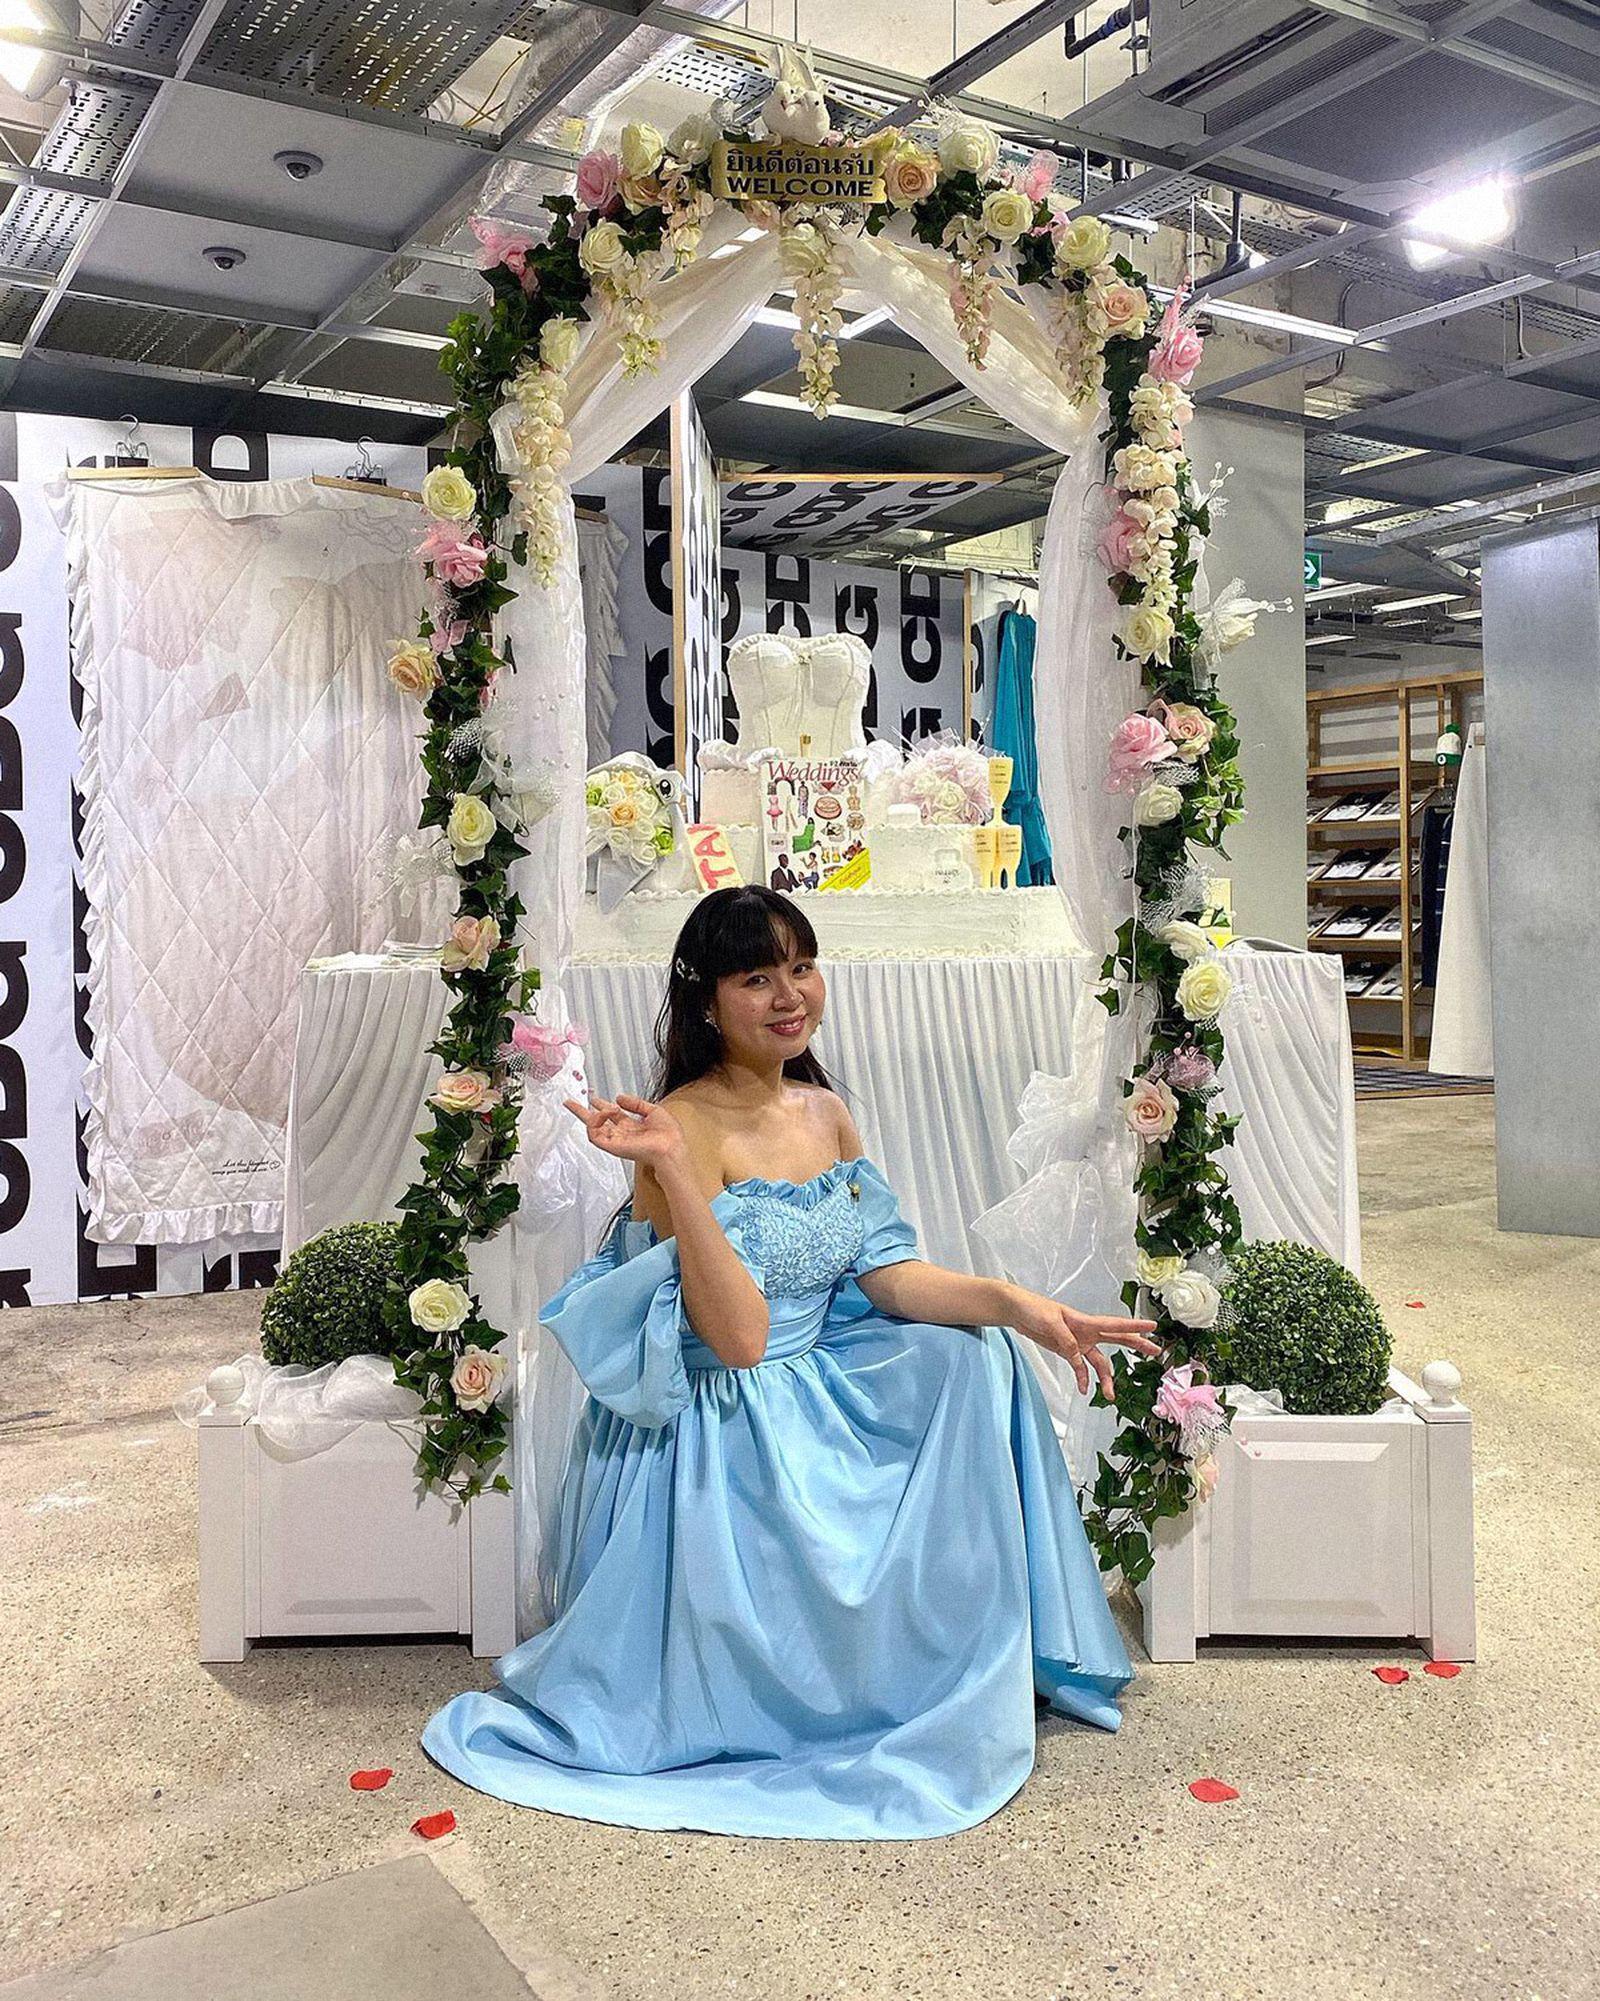 designer-pz-opassuksatit-weddings-love-working-vetements-main